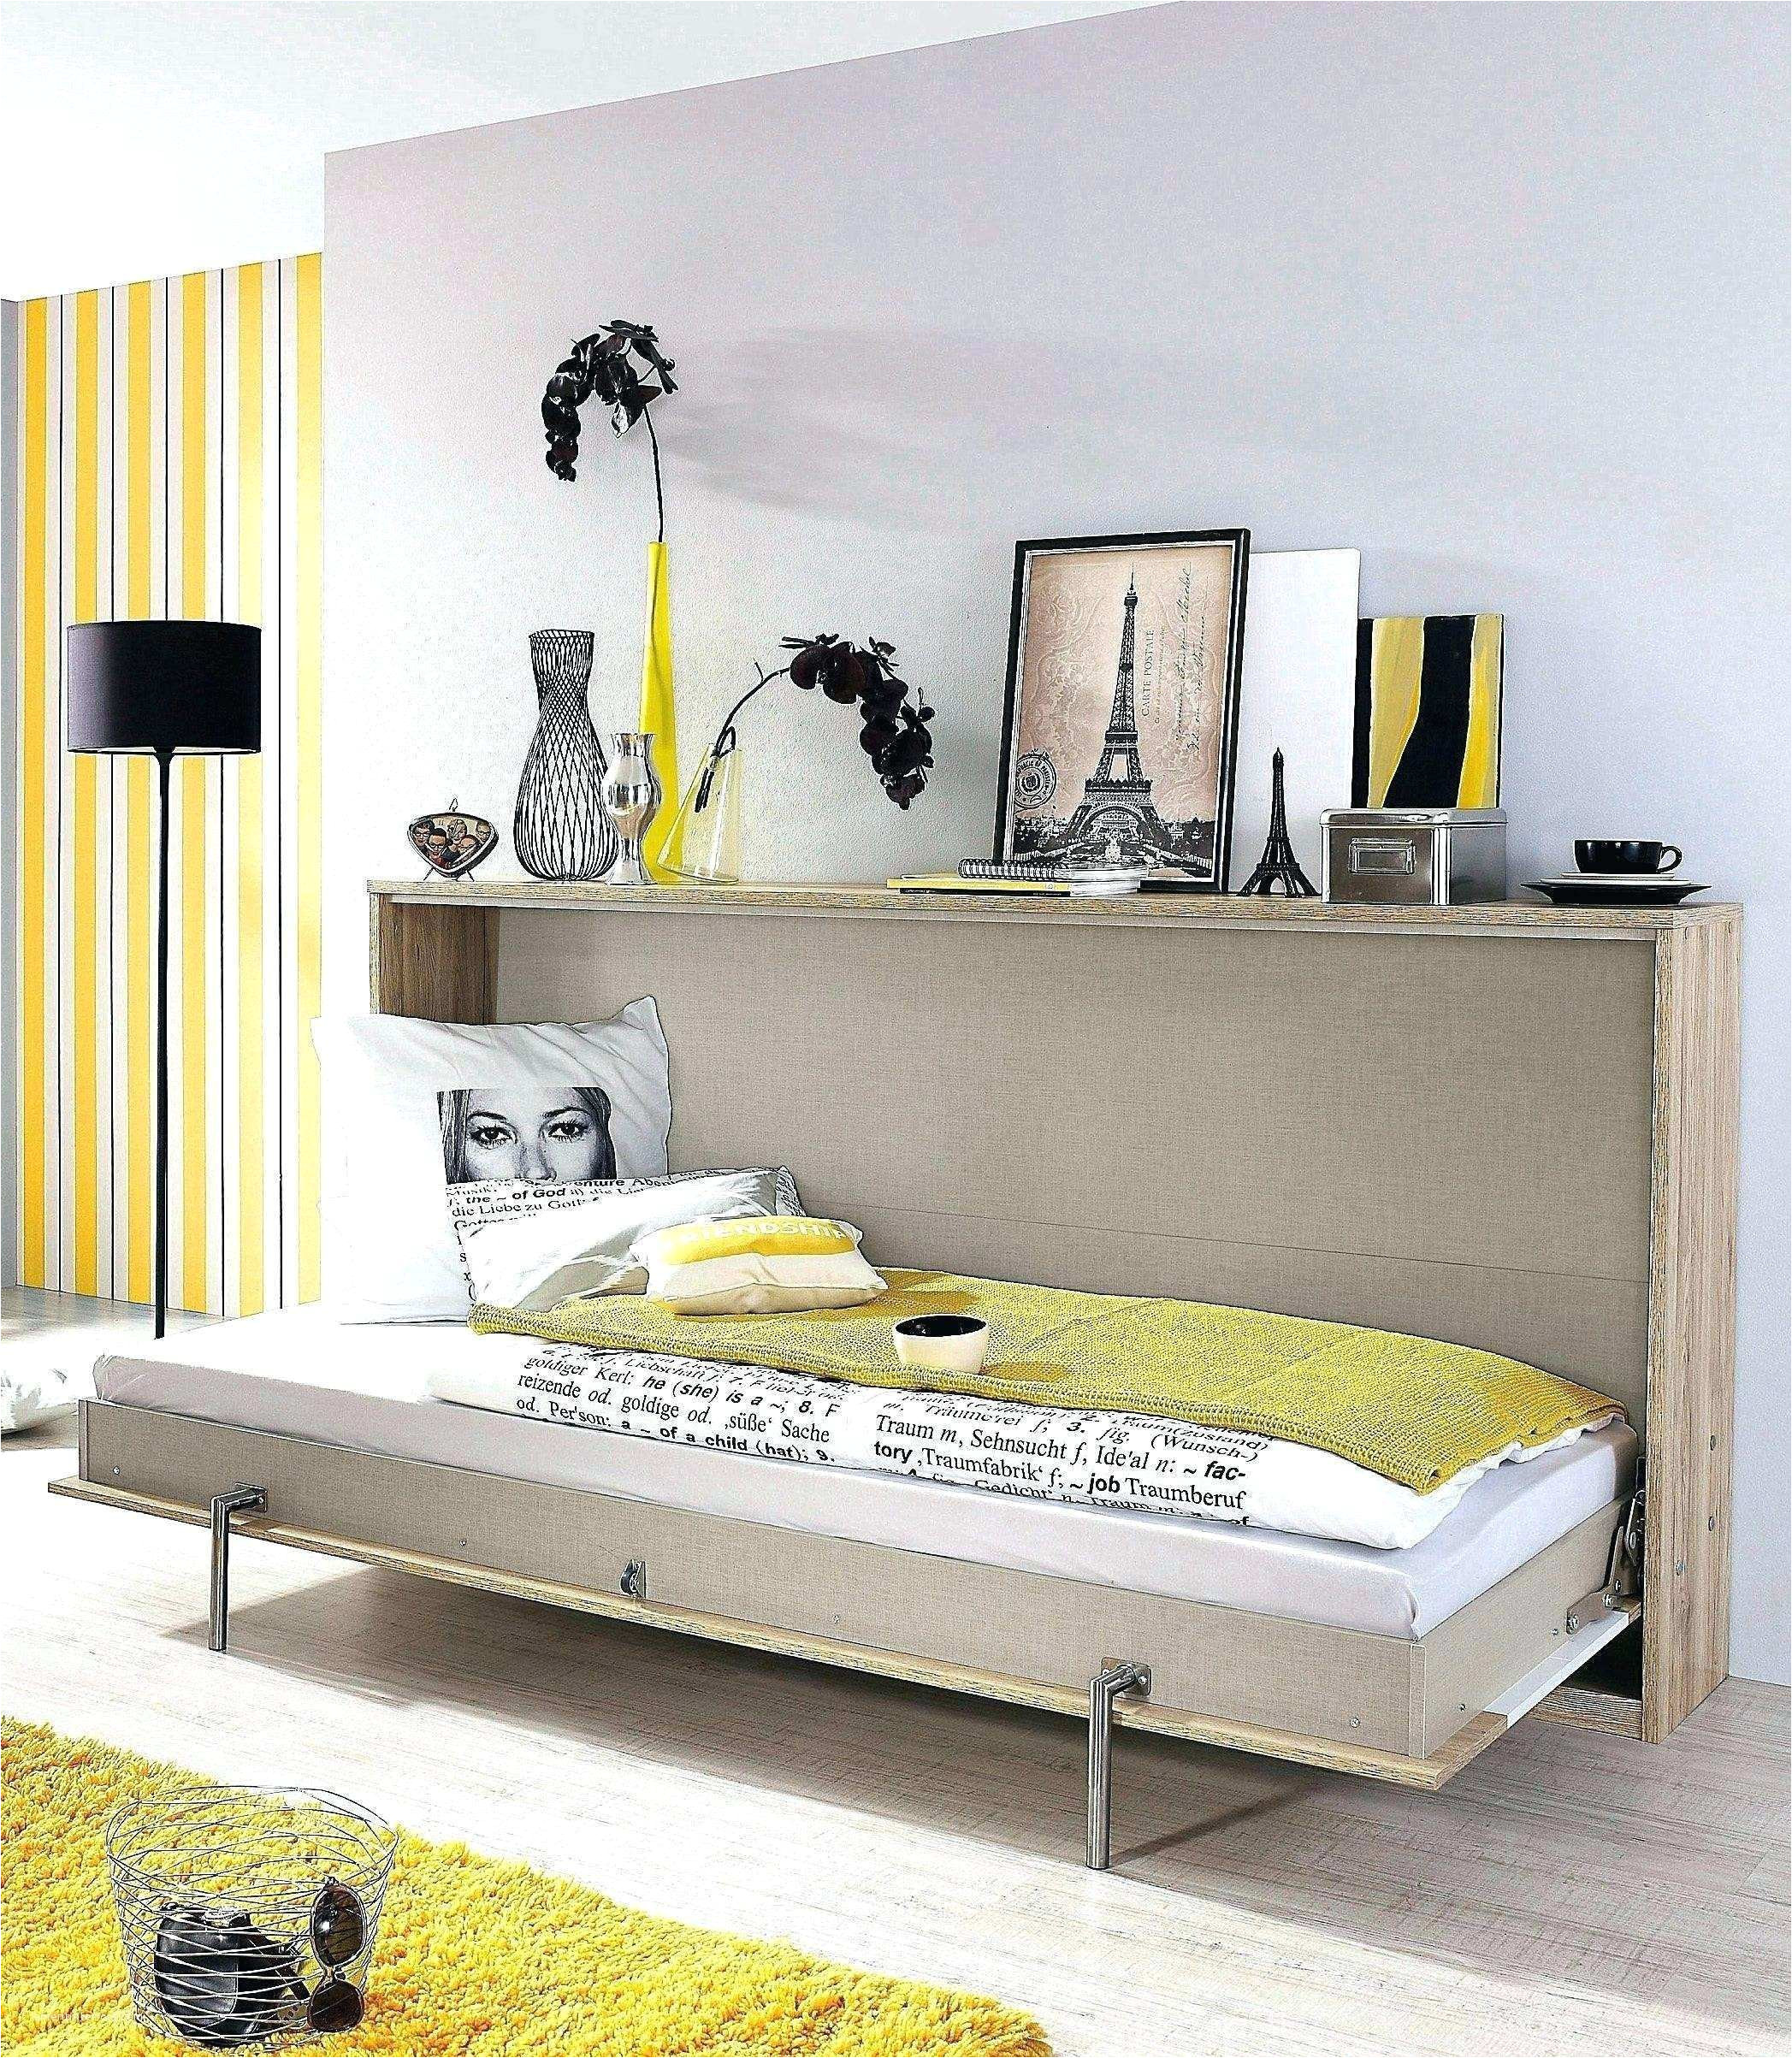 dishy ikea twin bed inspired 50 frisch bett ikea 200x200